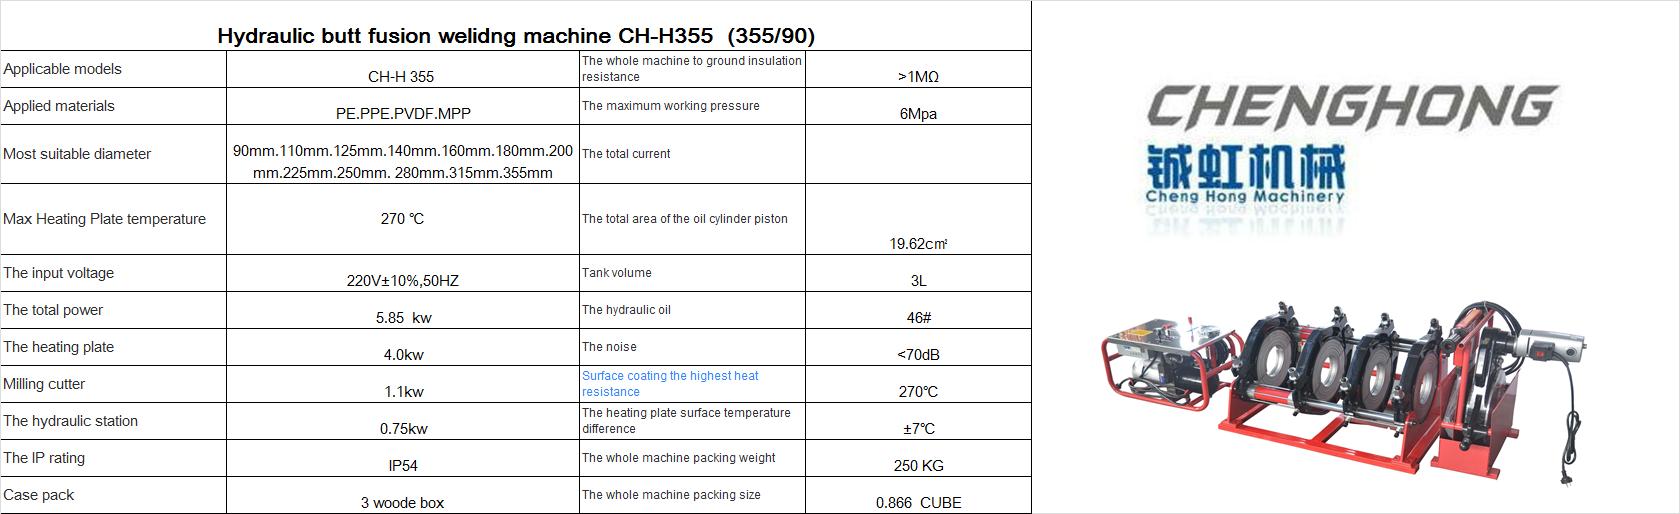 ch-h355